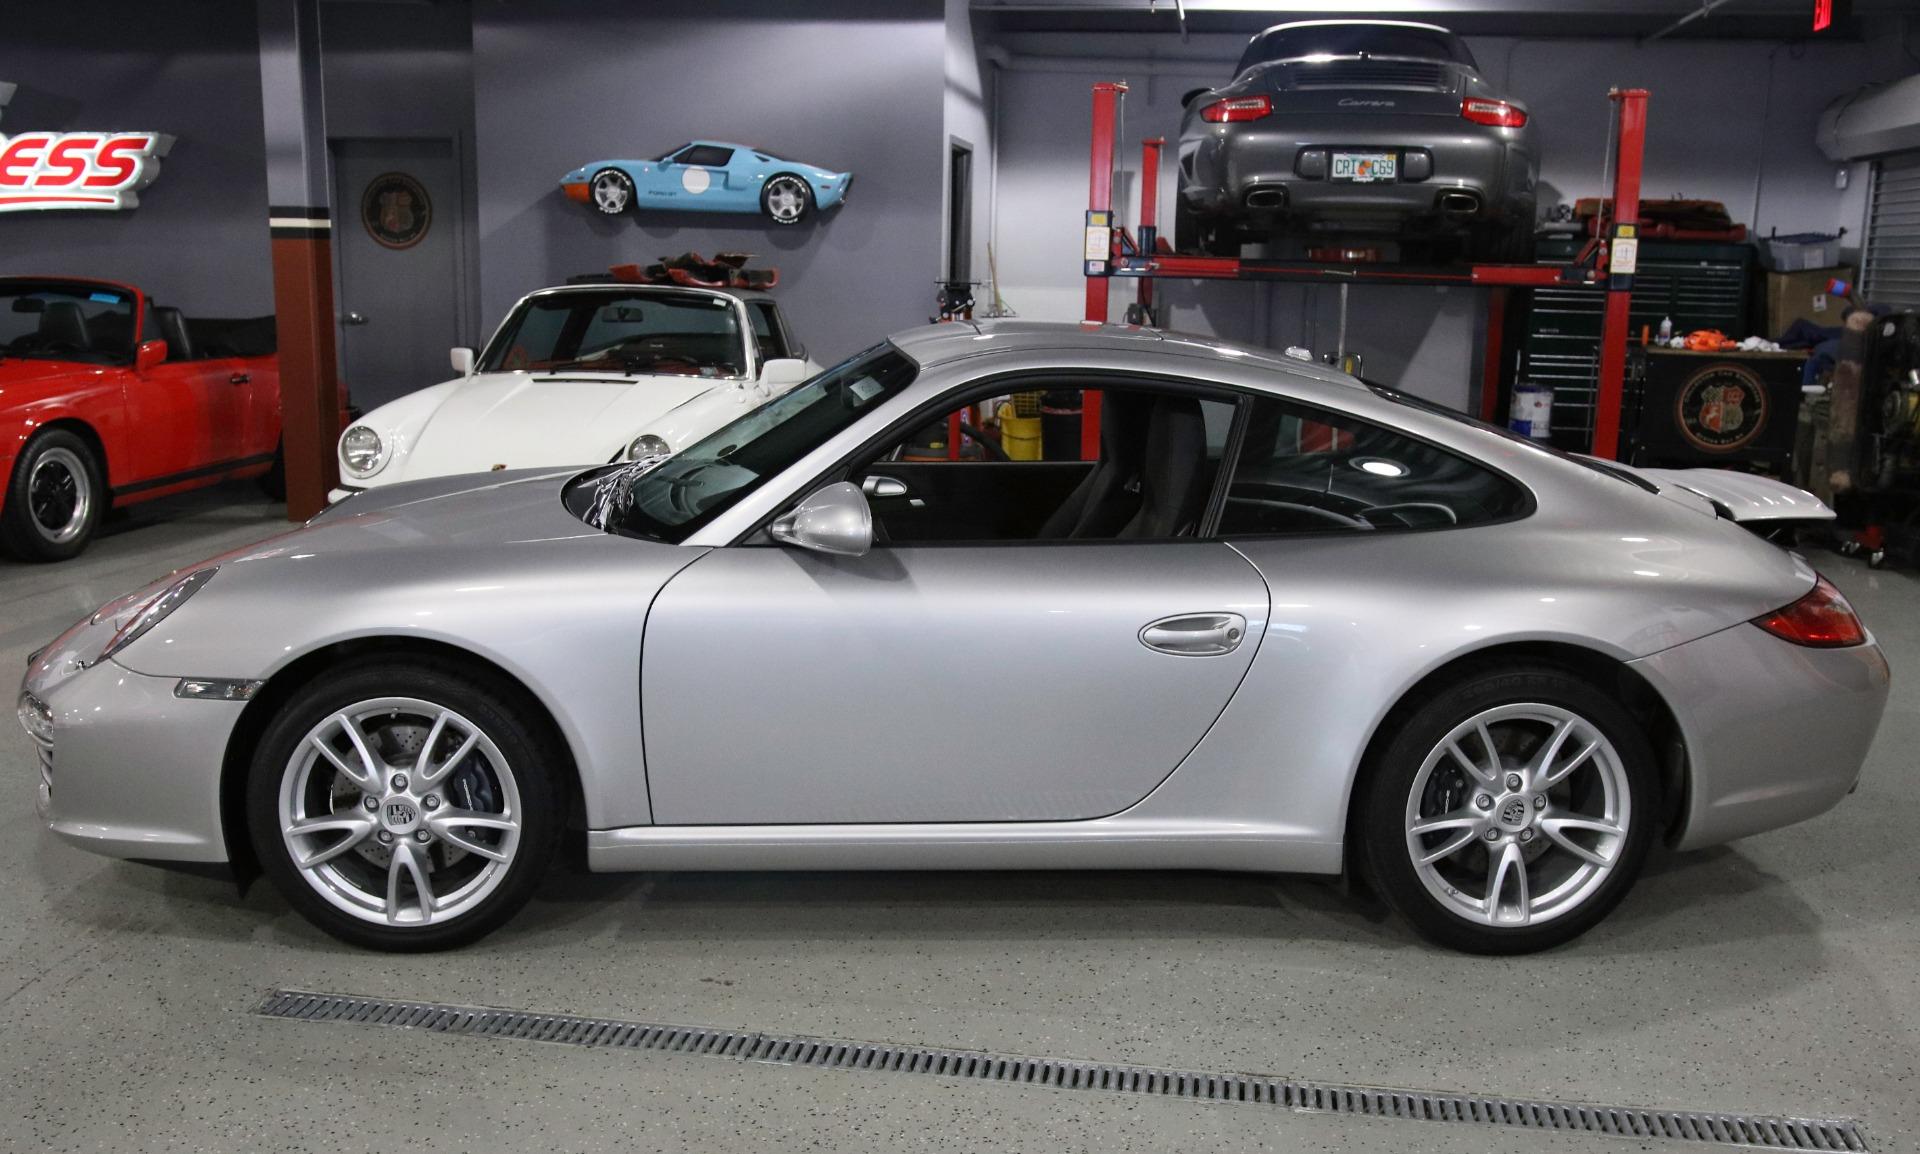 2010 porsche 911 carrera coupe stock 1203 for sale near oyster bay ny ny porsche dealer. Black Bedroom Furniture Sets. Home Design Ideas